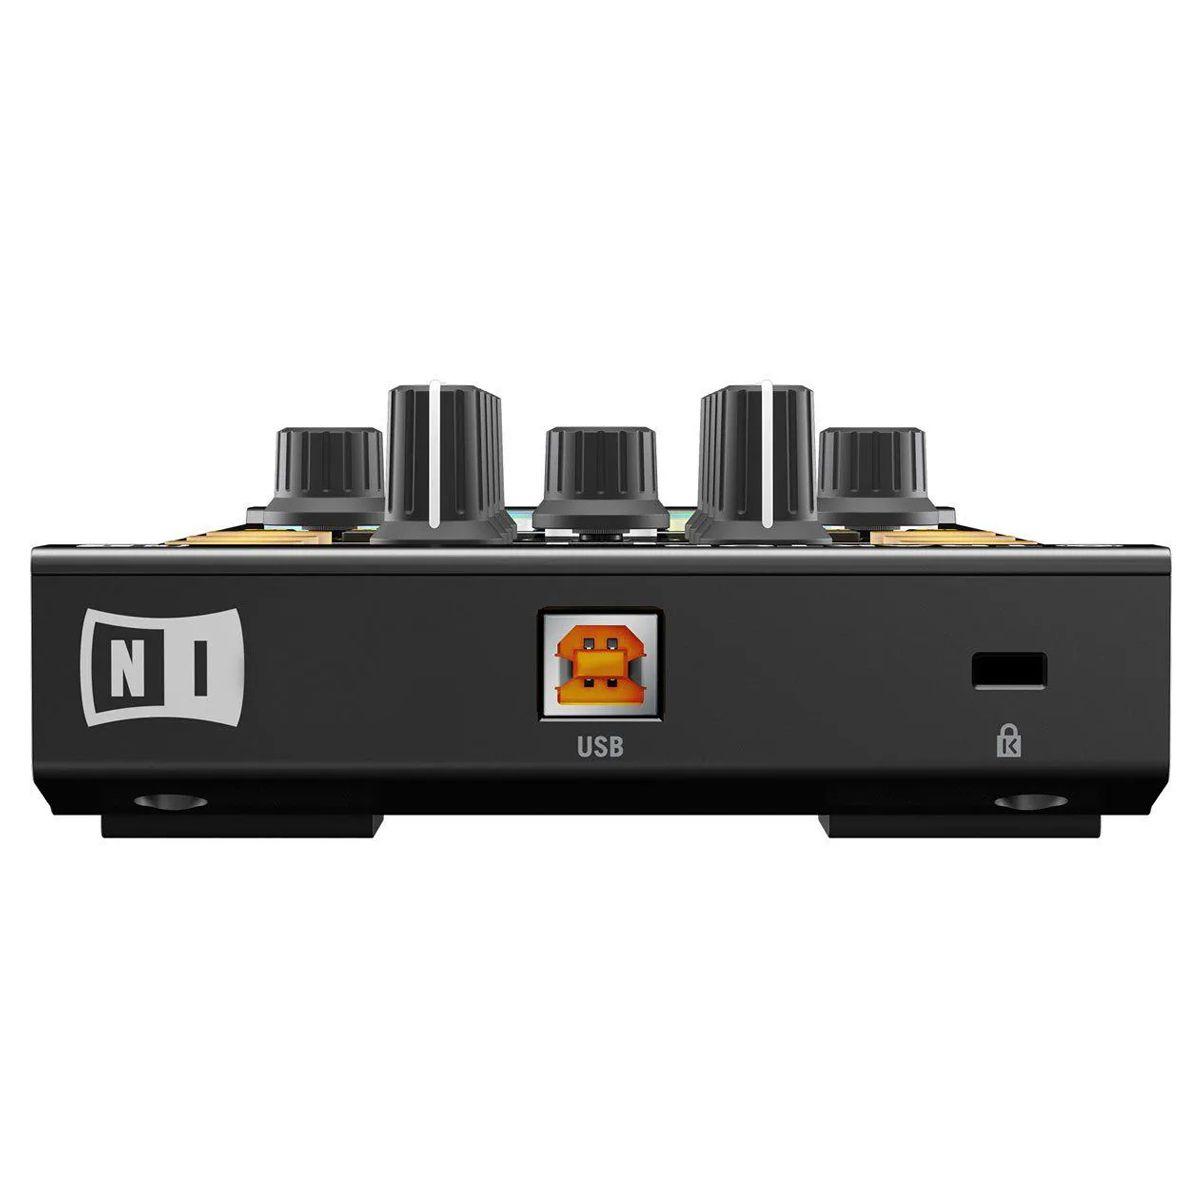 Controladora Native Instruments Traktor Kontrol X1 com case UDG